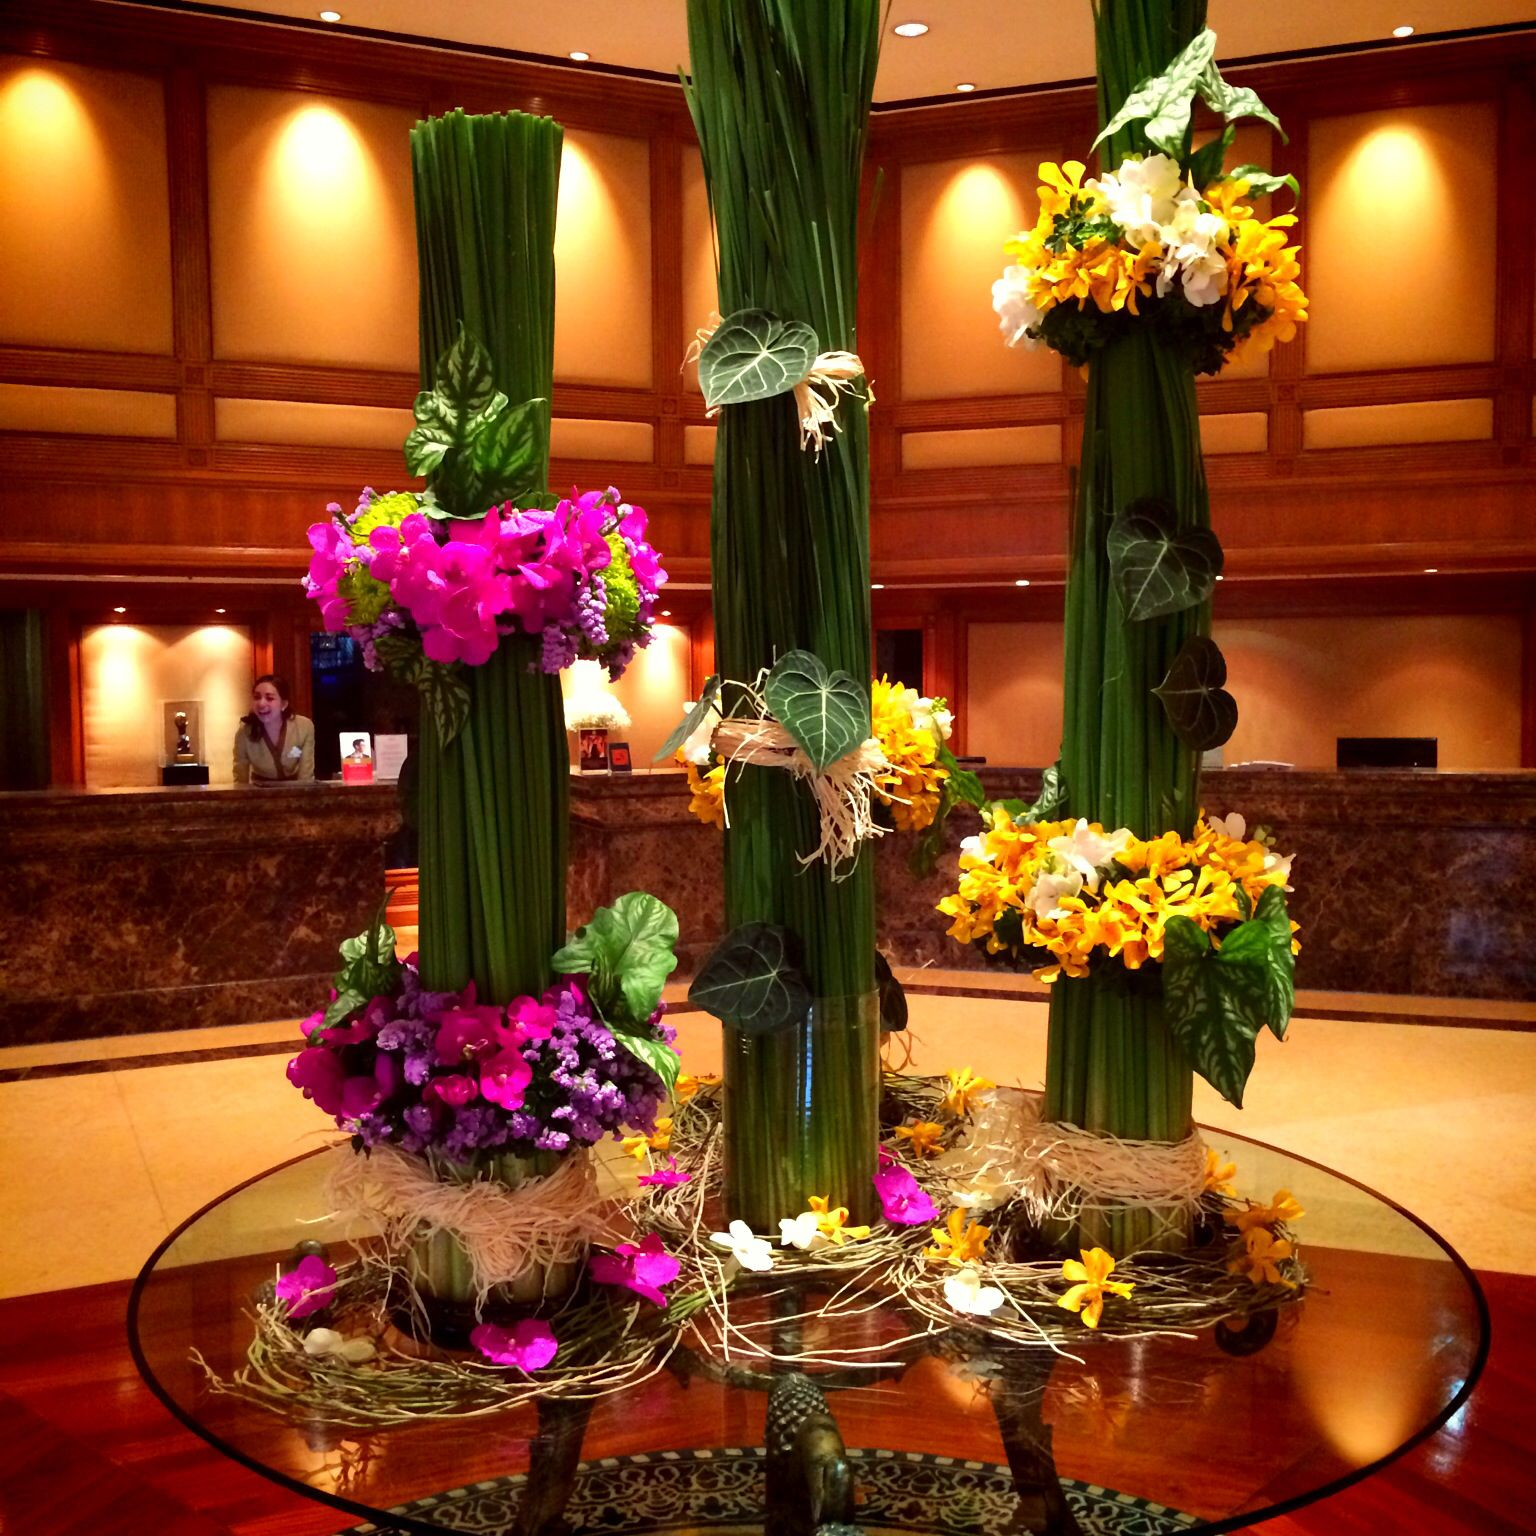 Hotel Lobby Fresh Flowers Arrangements Large Flower Arrangements Hotel Flowers